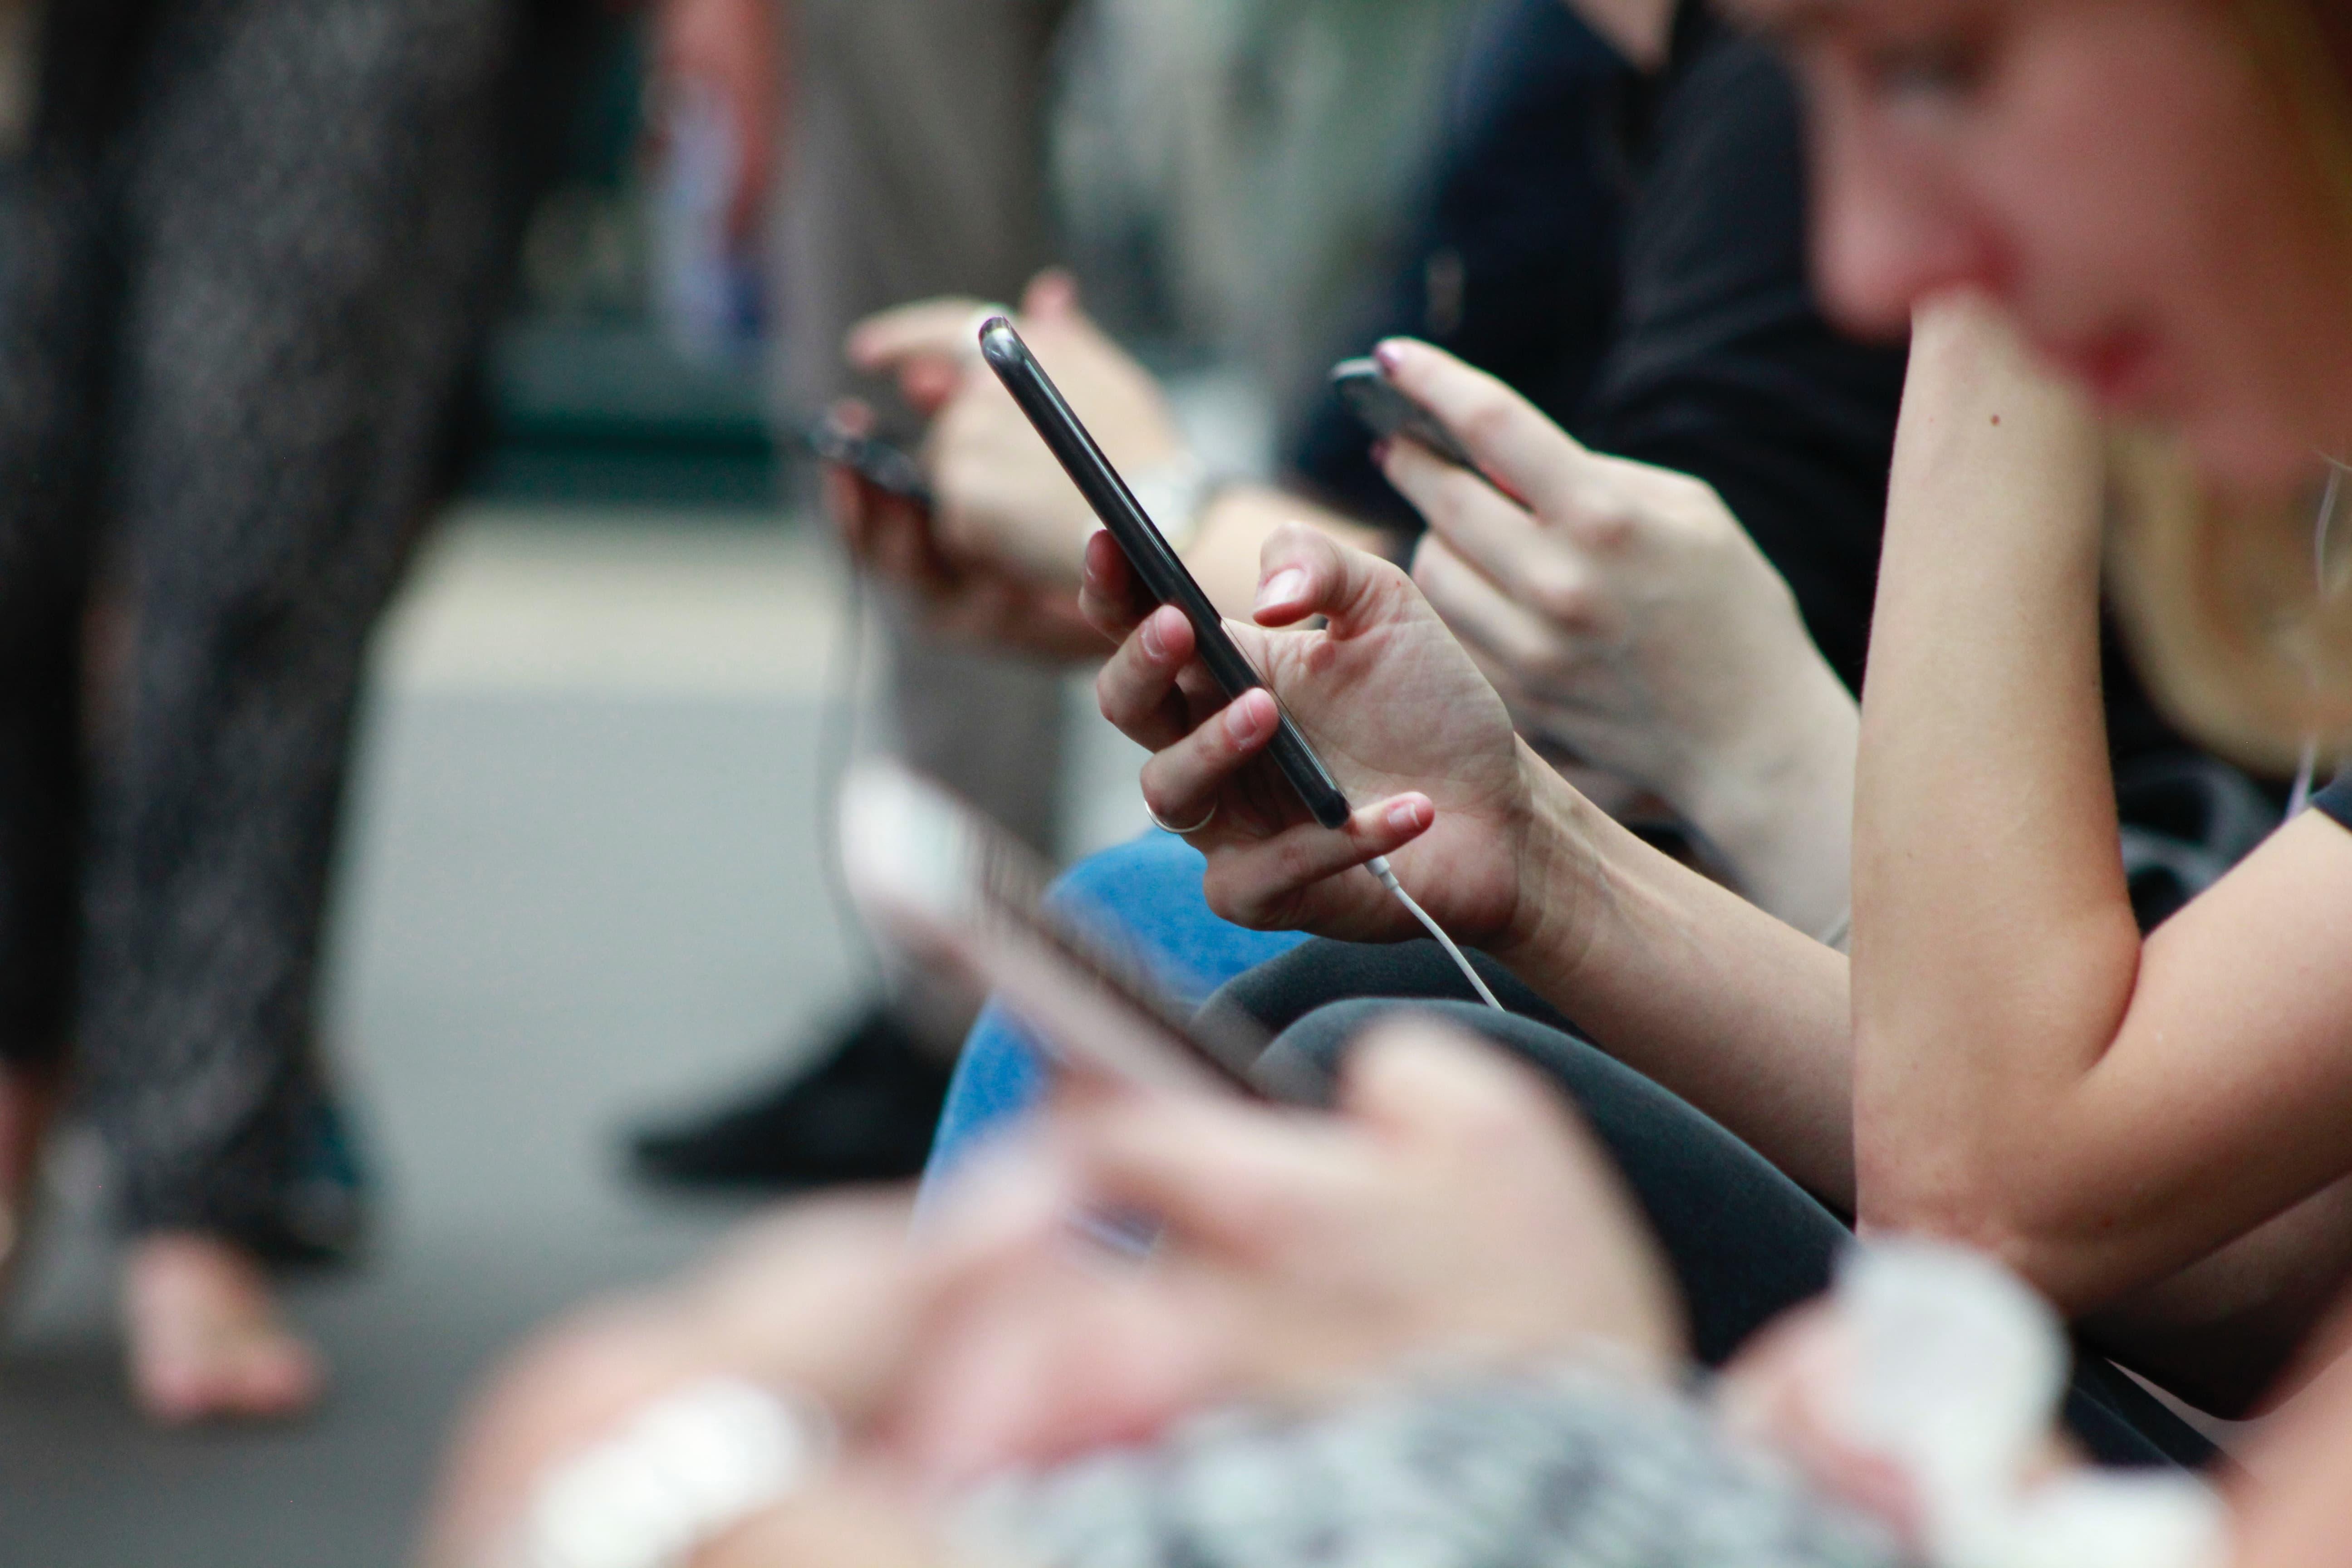 people sitting down on their phones